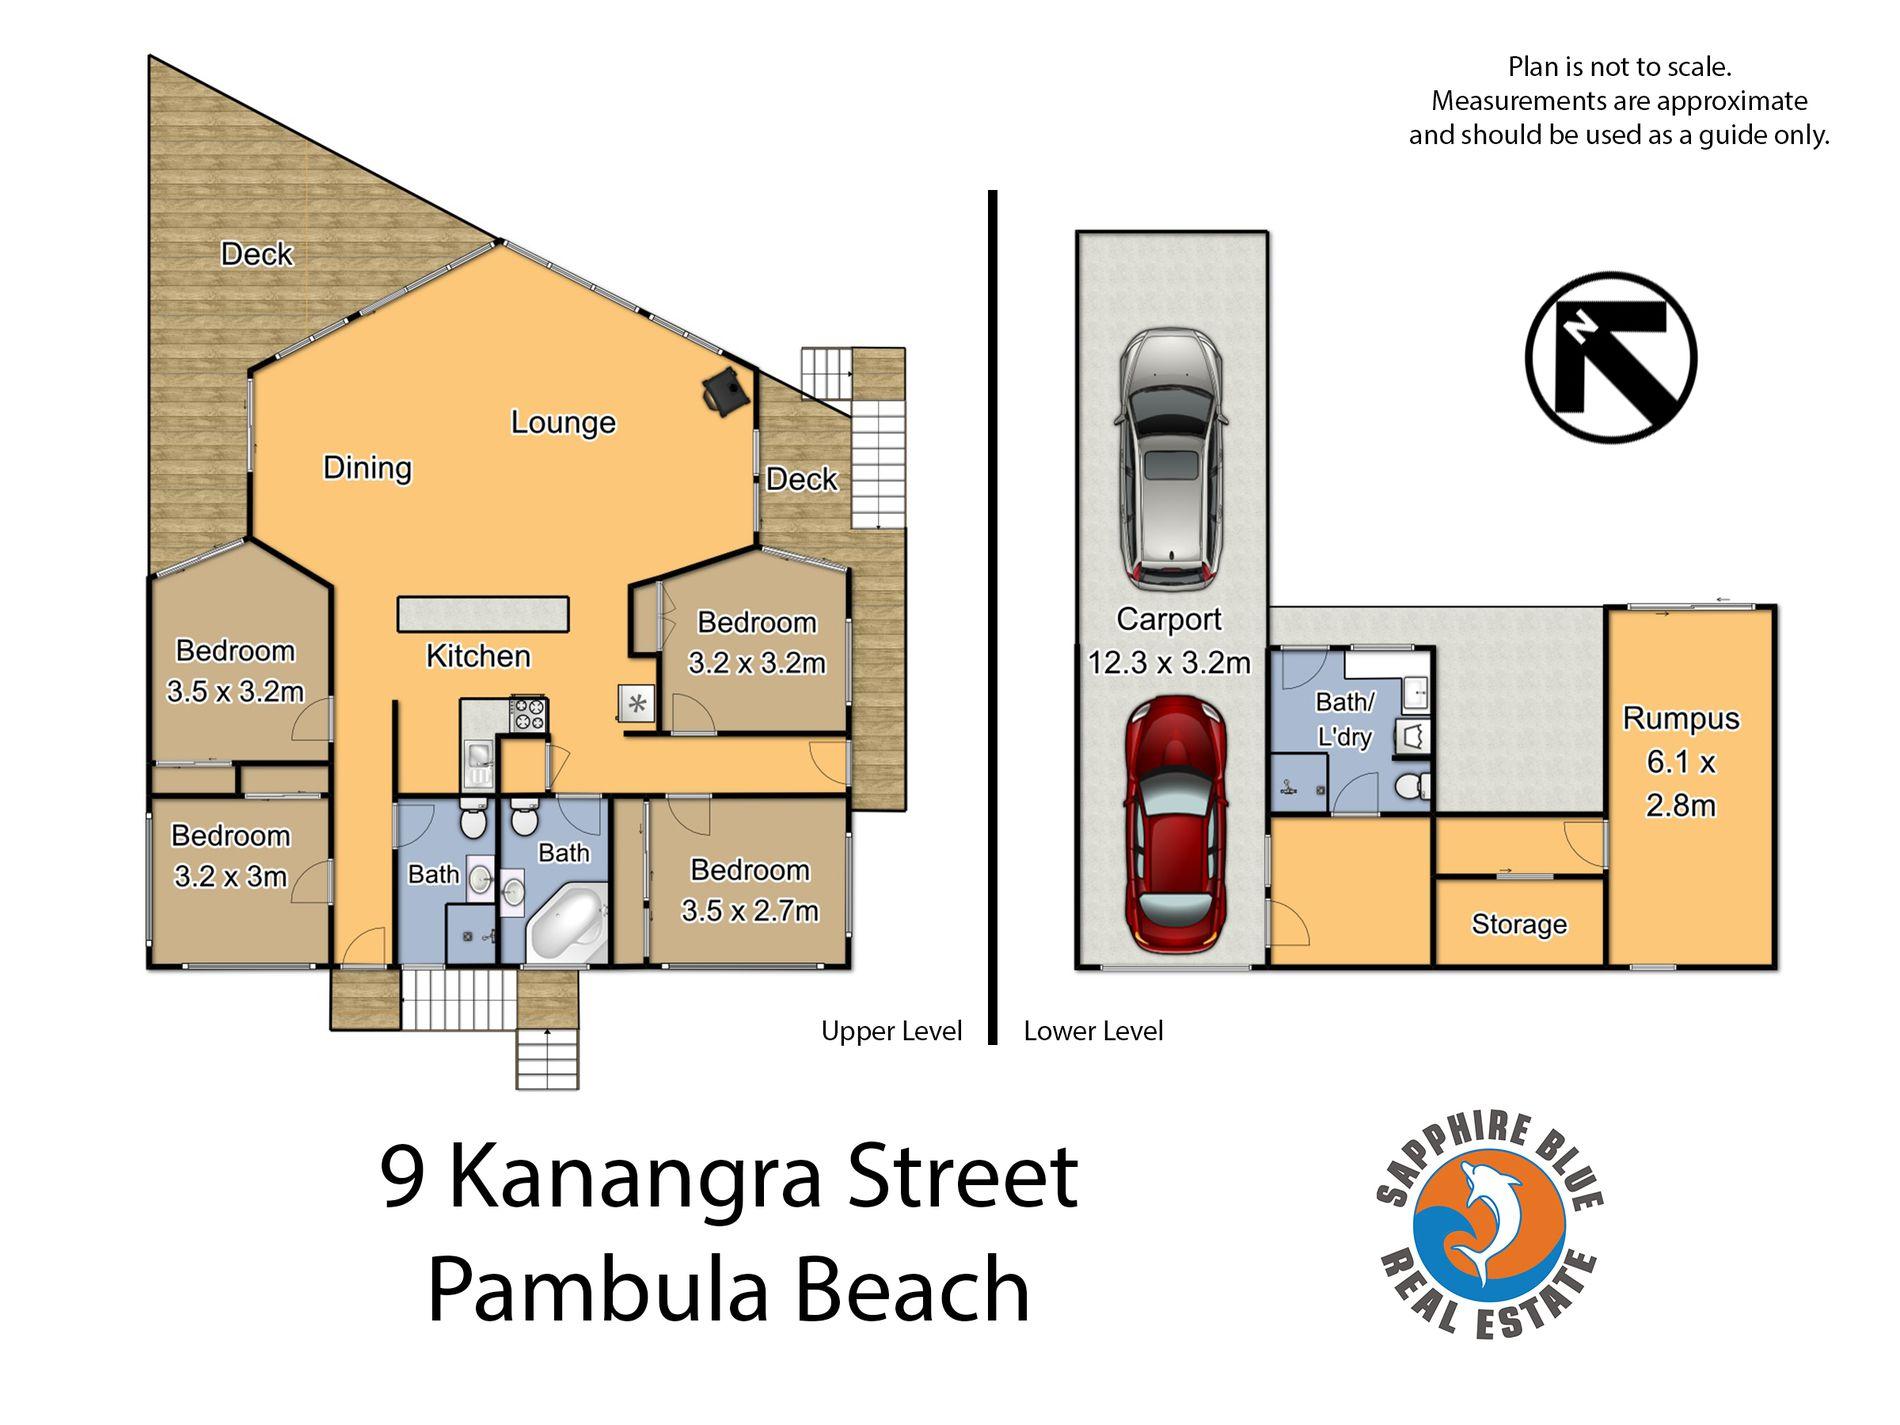 9 Kanangra Street, Pambula Beach